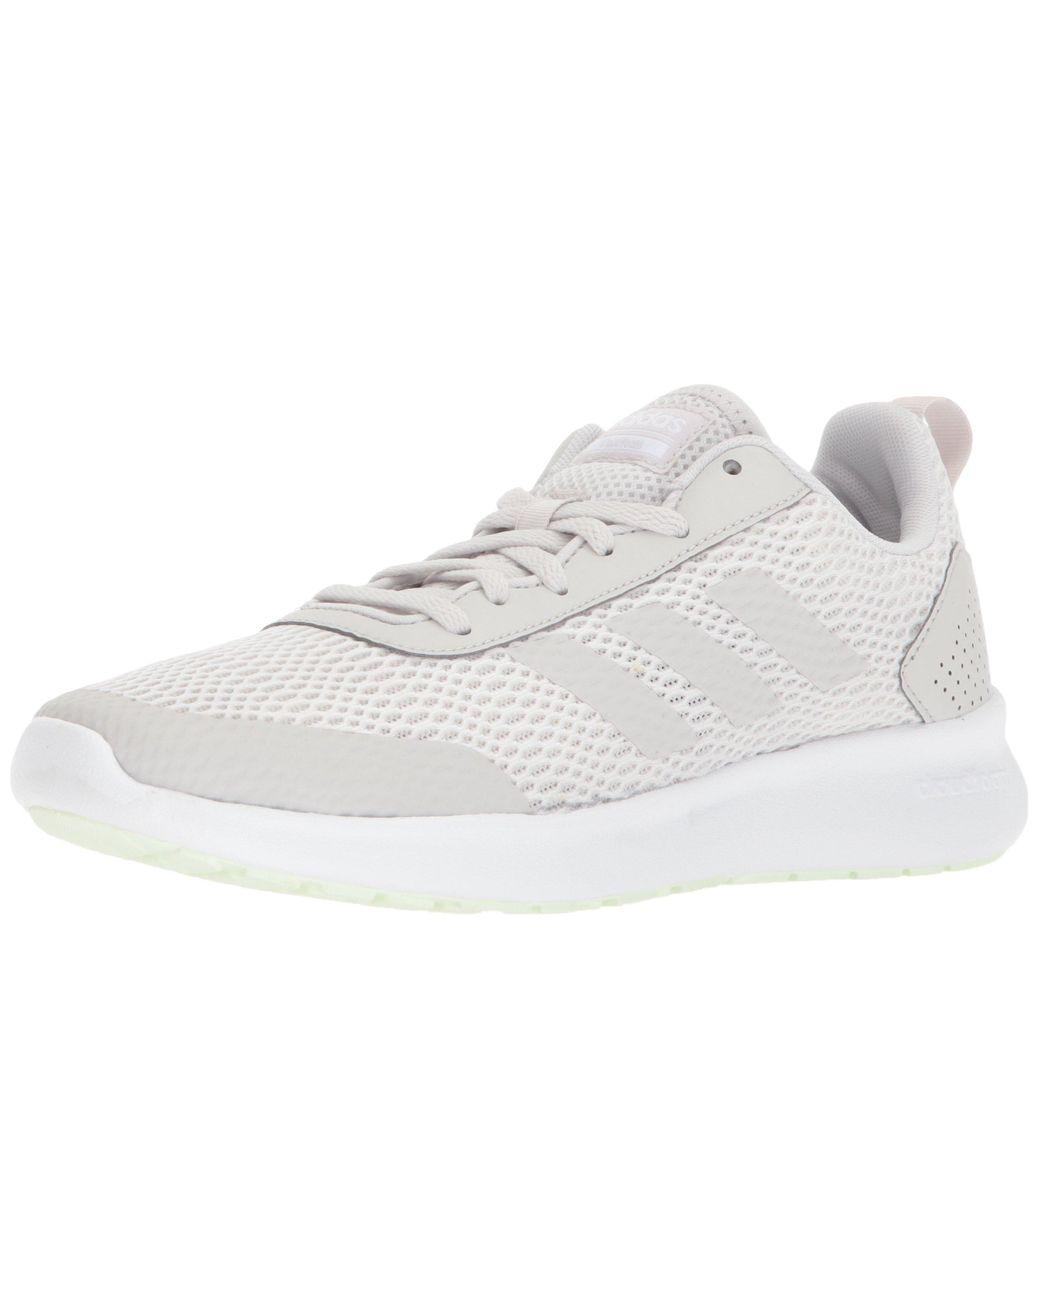 adidas Argecy Running Shoe in White